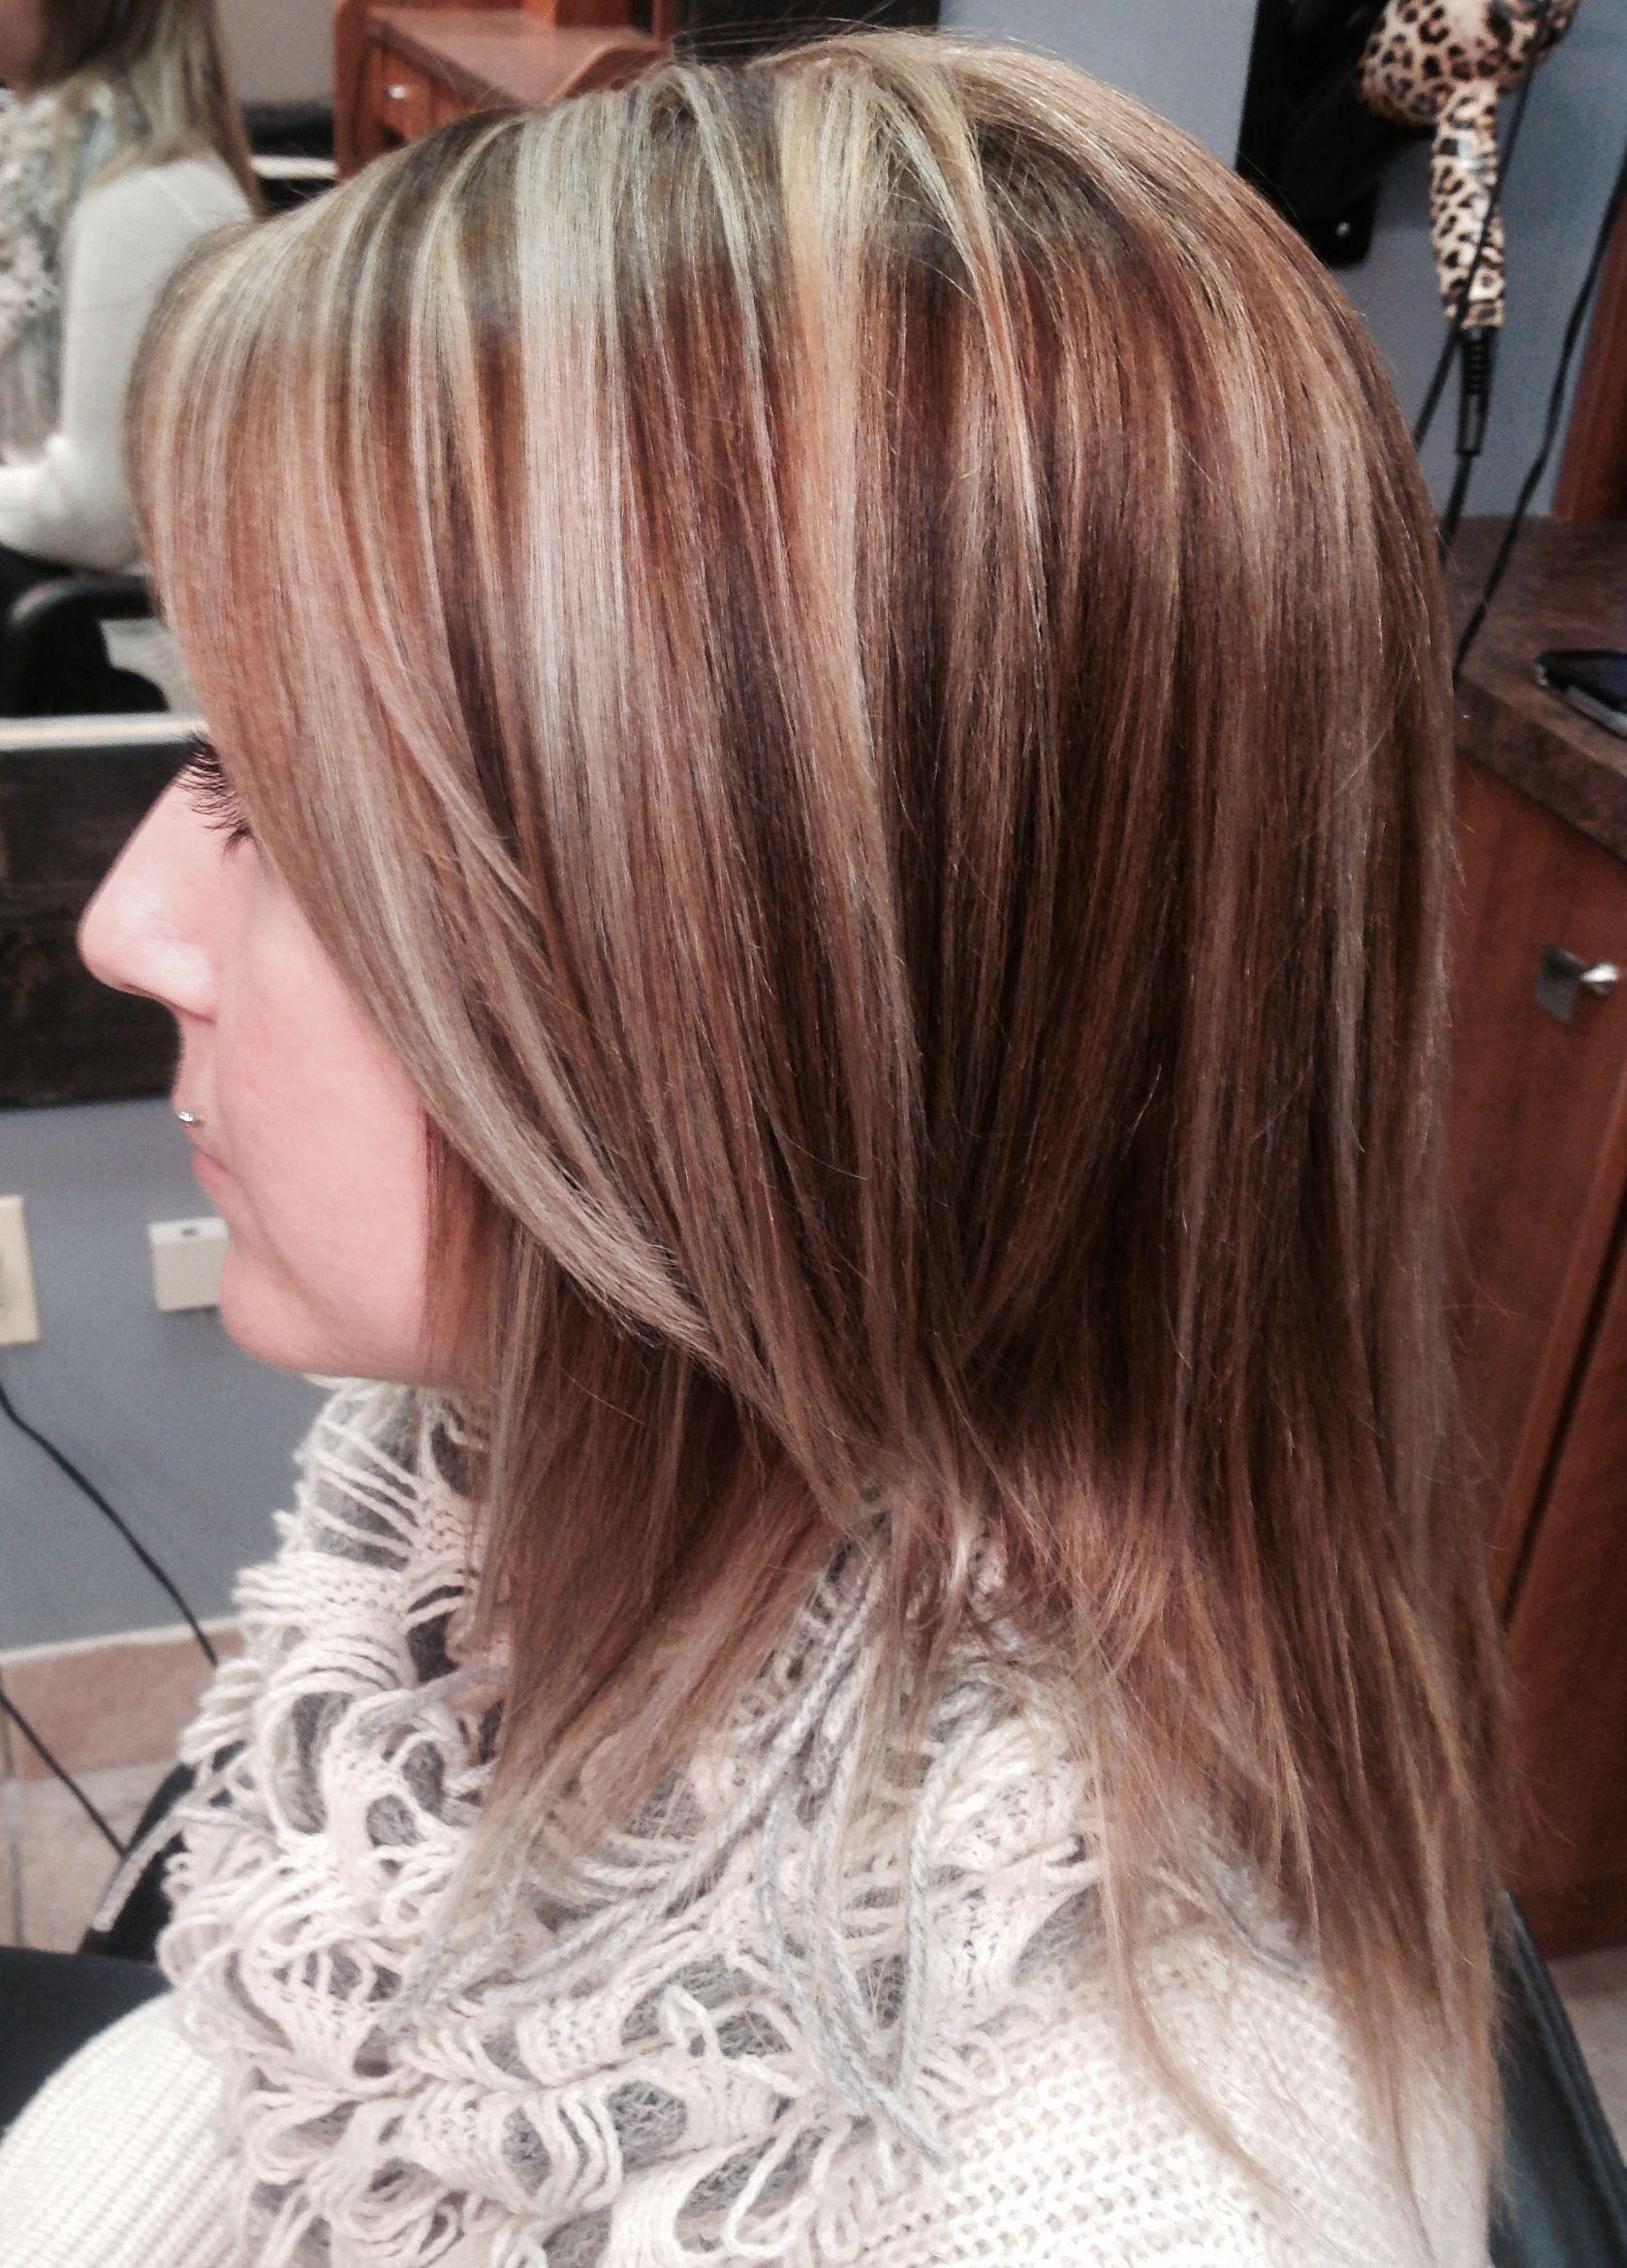 Highlights Lowlights Long Hair Straight Hair Easy Style Pretty Color